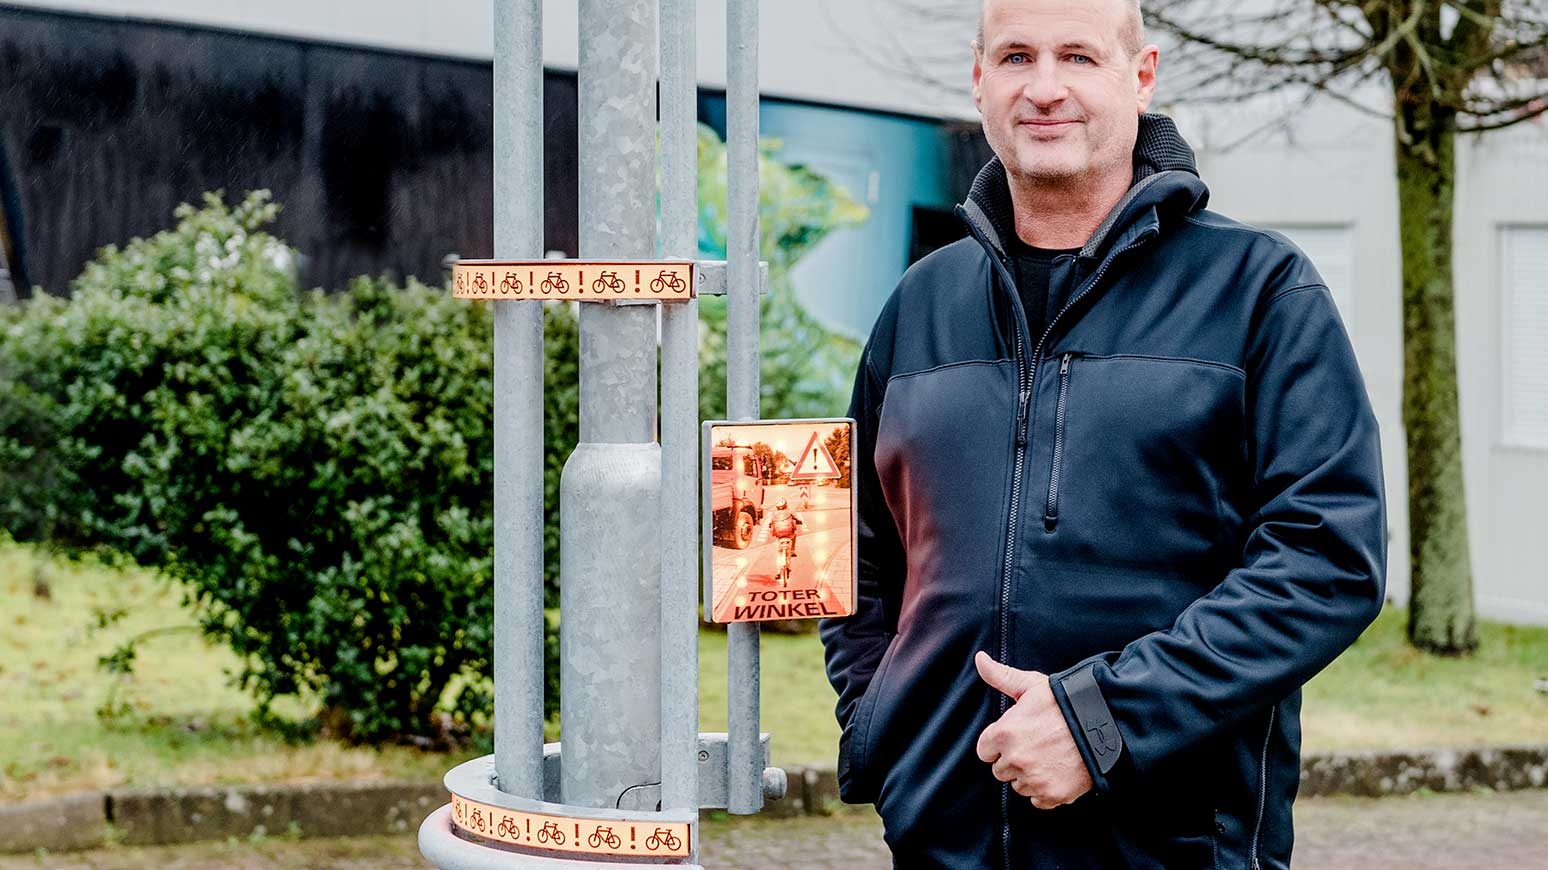 Entwickler Martin Budde zeigt das Warnsystem Bike-Flash.